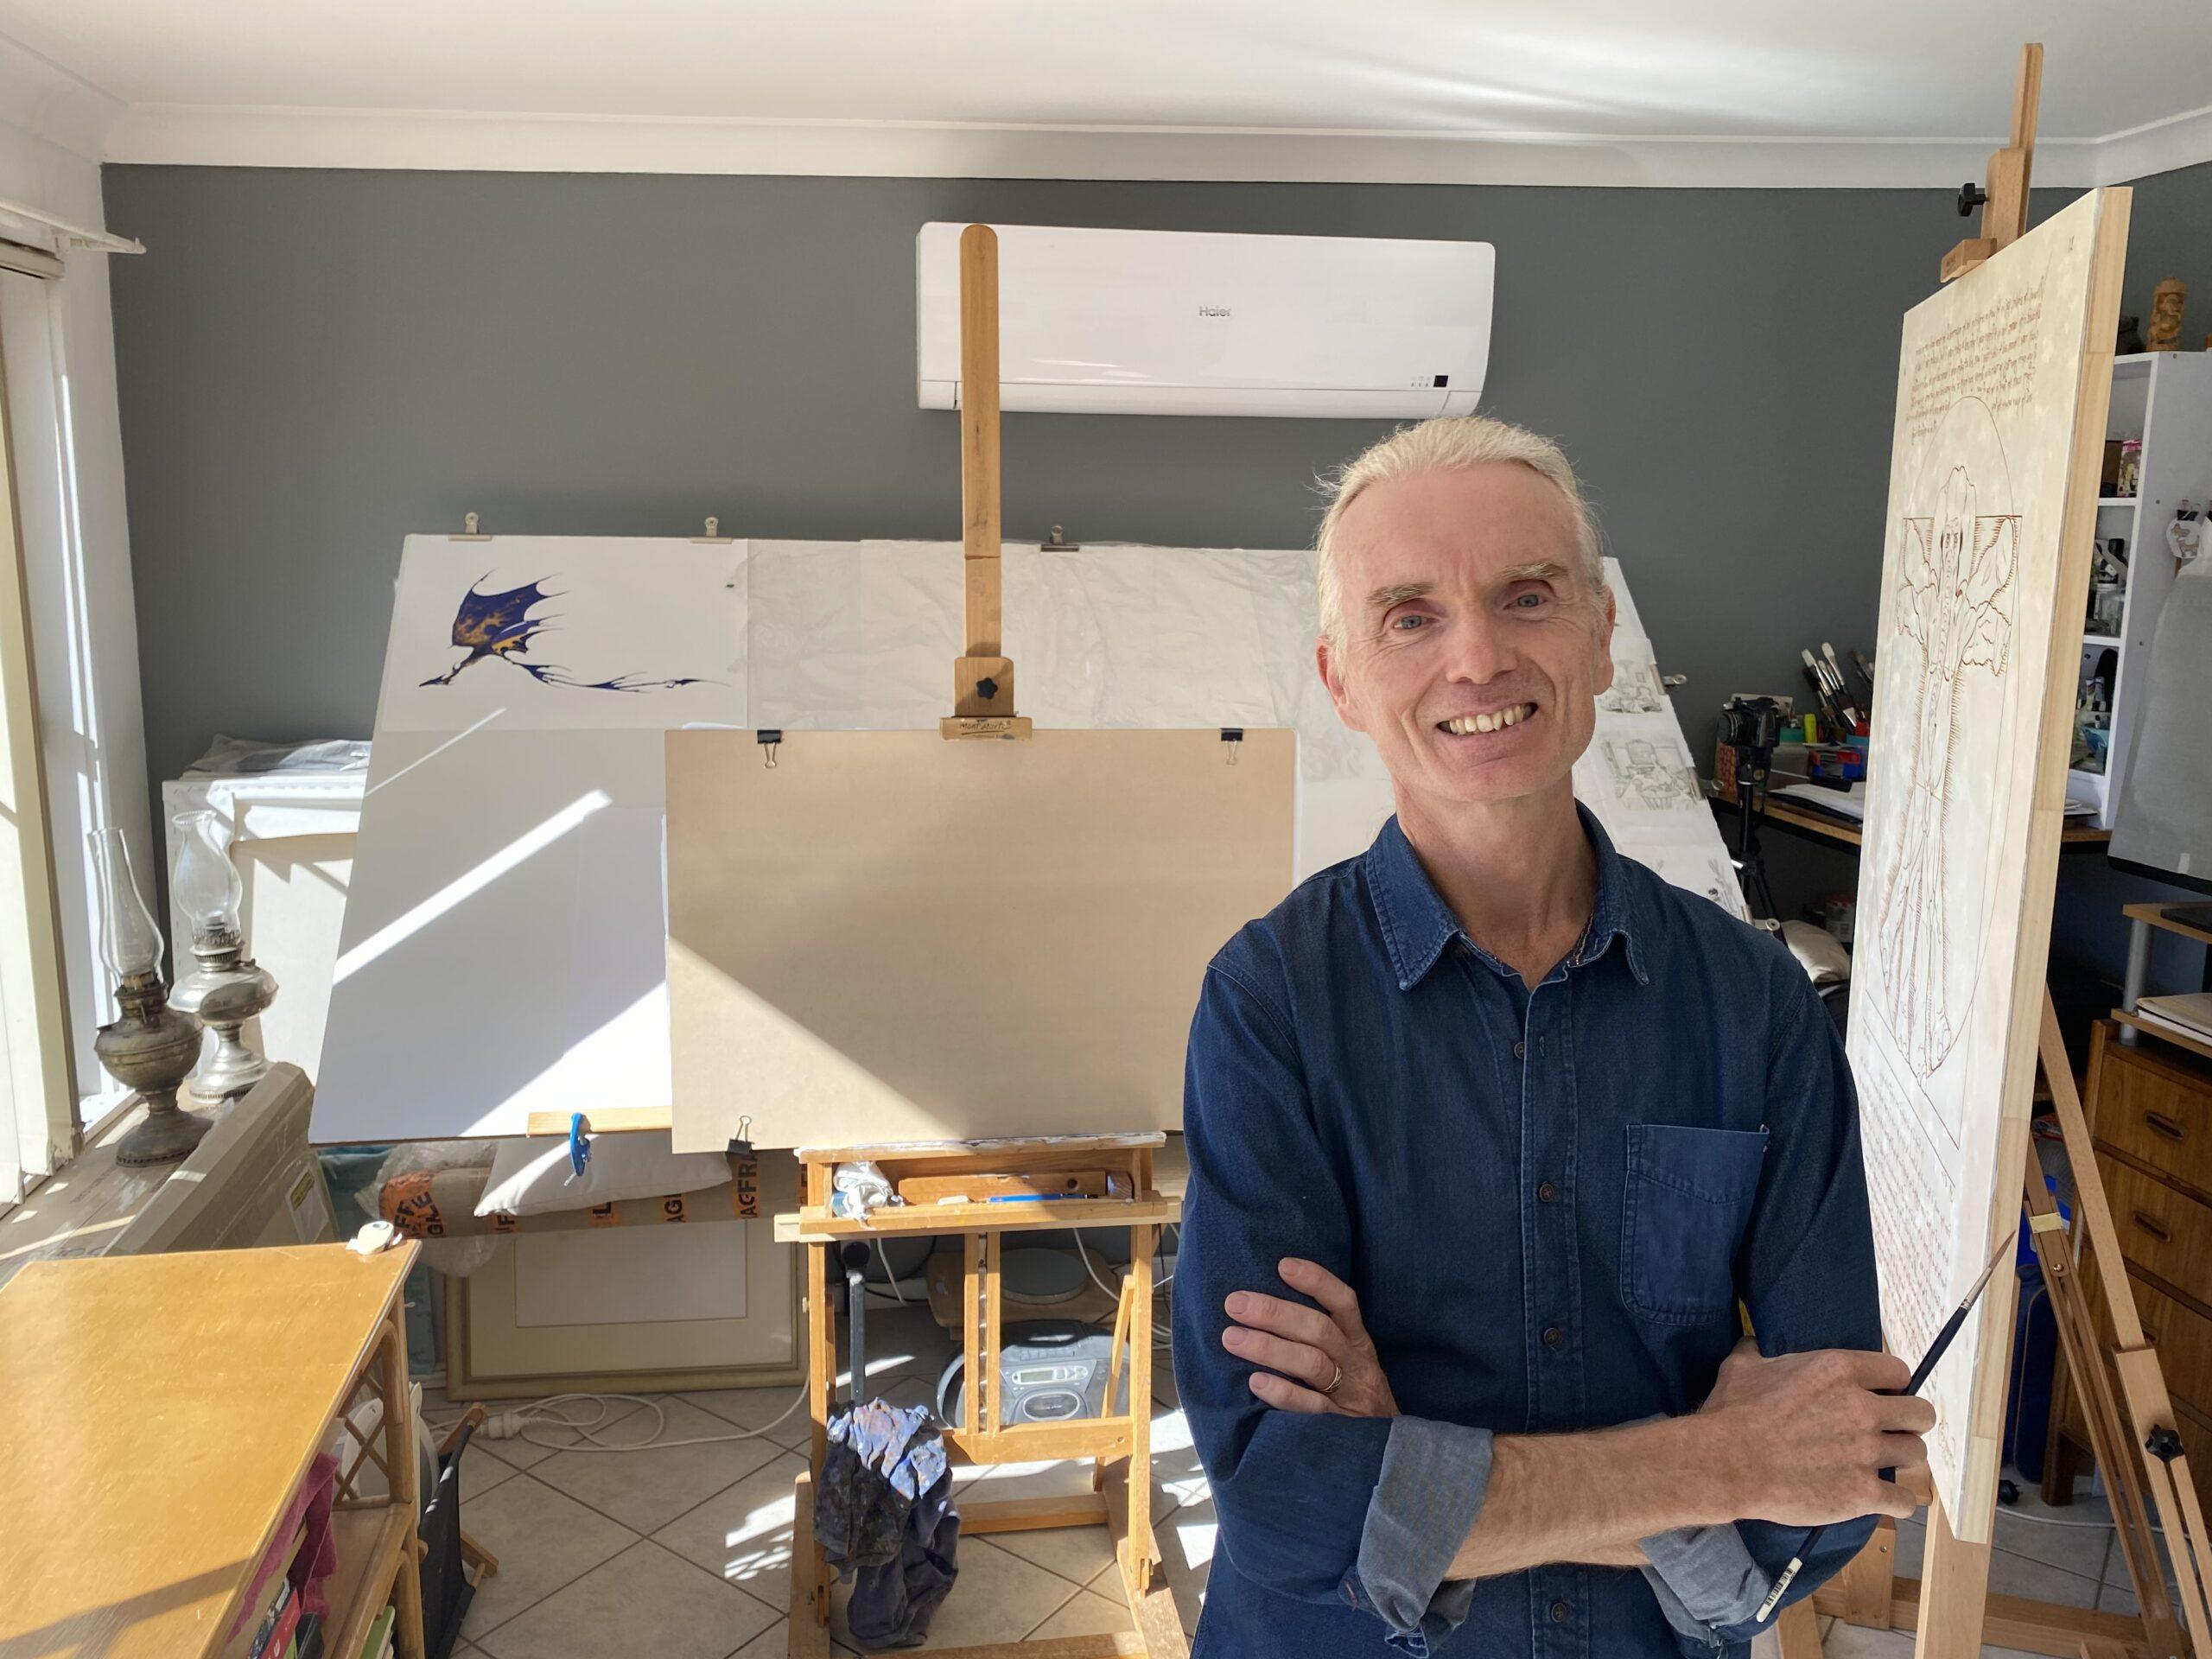 Jumbo sized task a labour of love for artist Graeme